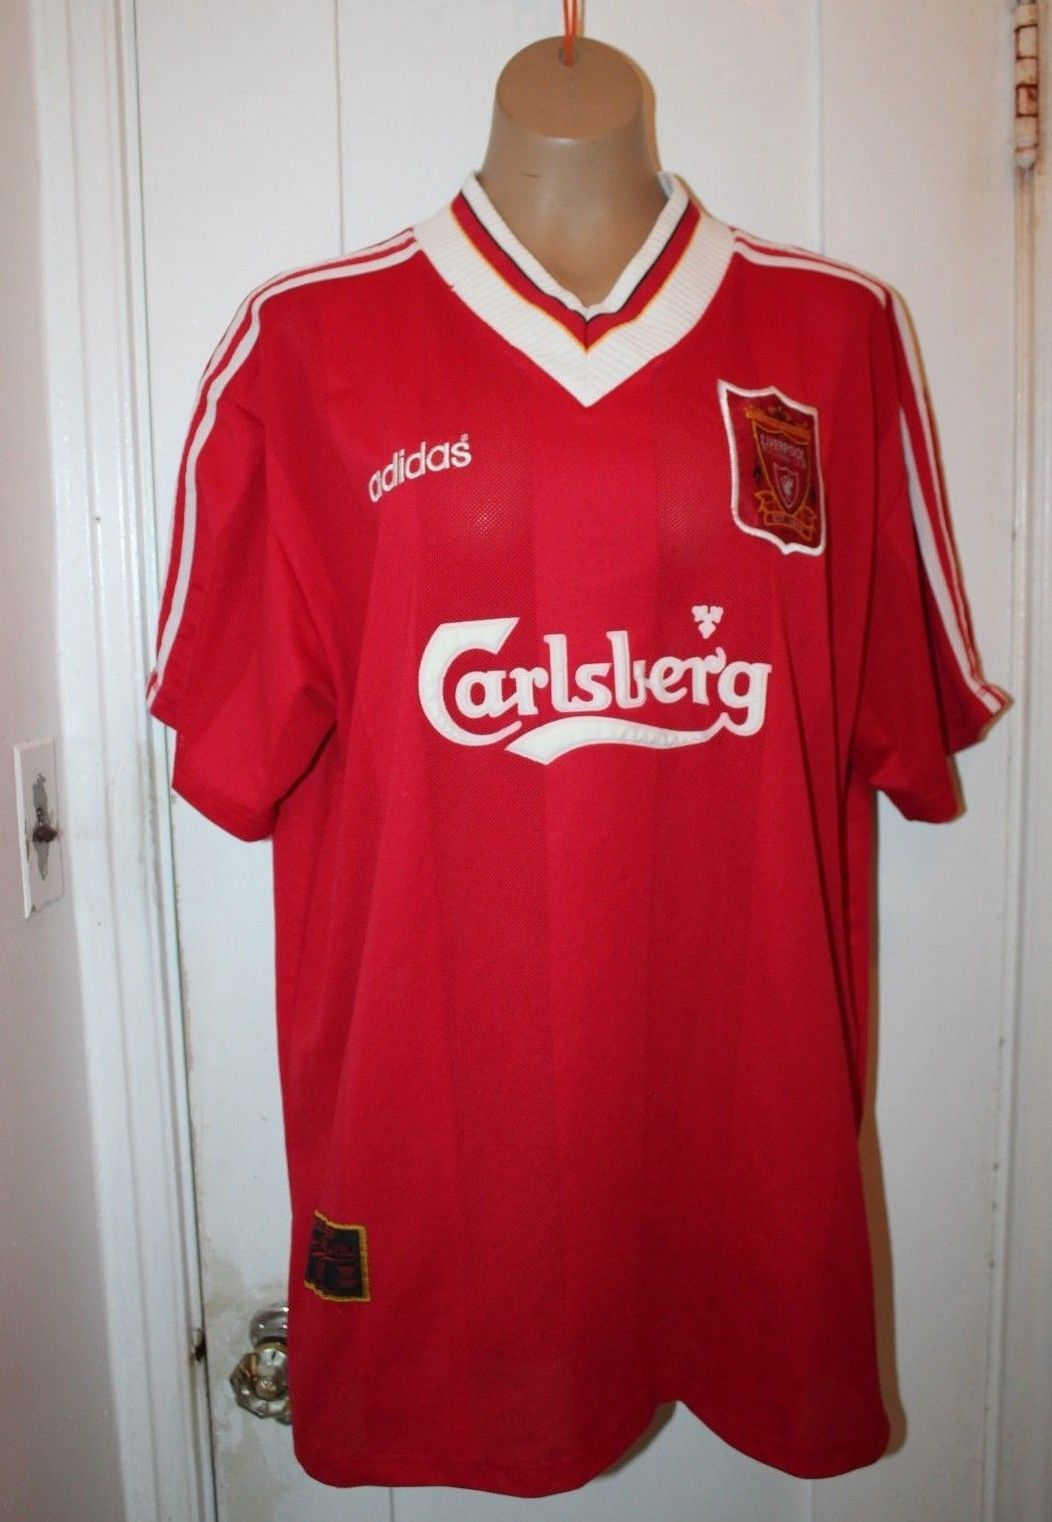 ADIDAS Vintage 1995-96 Liverpool FC Home Soccer Football Jersey Shirt 2XL  XXL (eBay Link) 24469f477